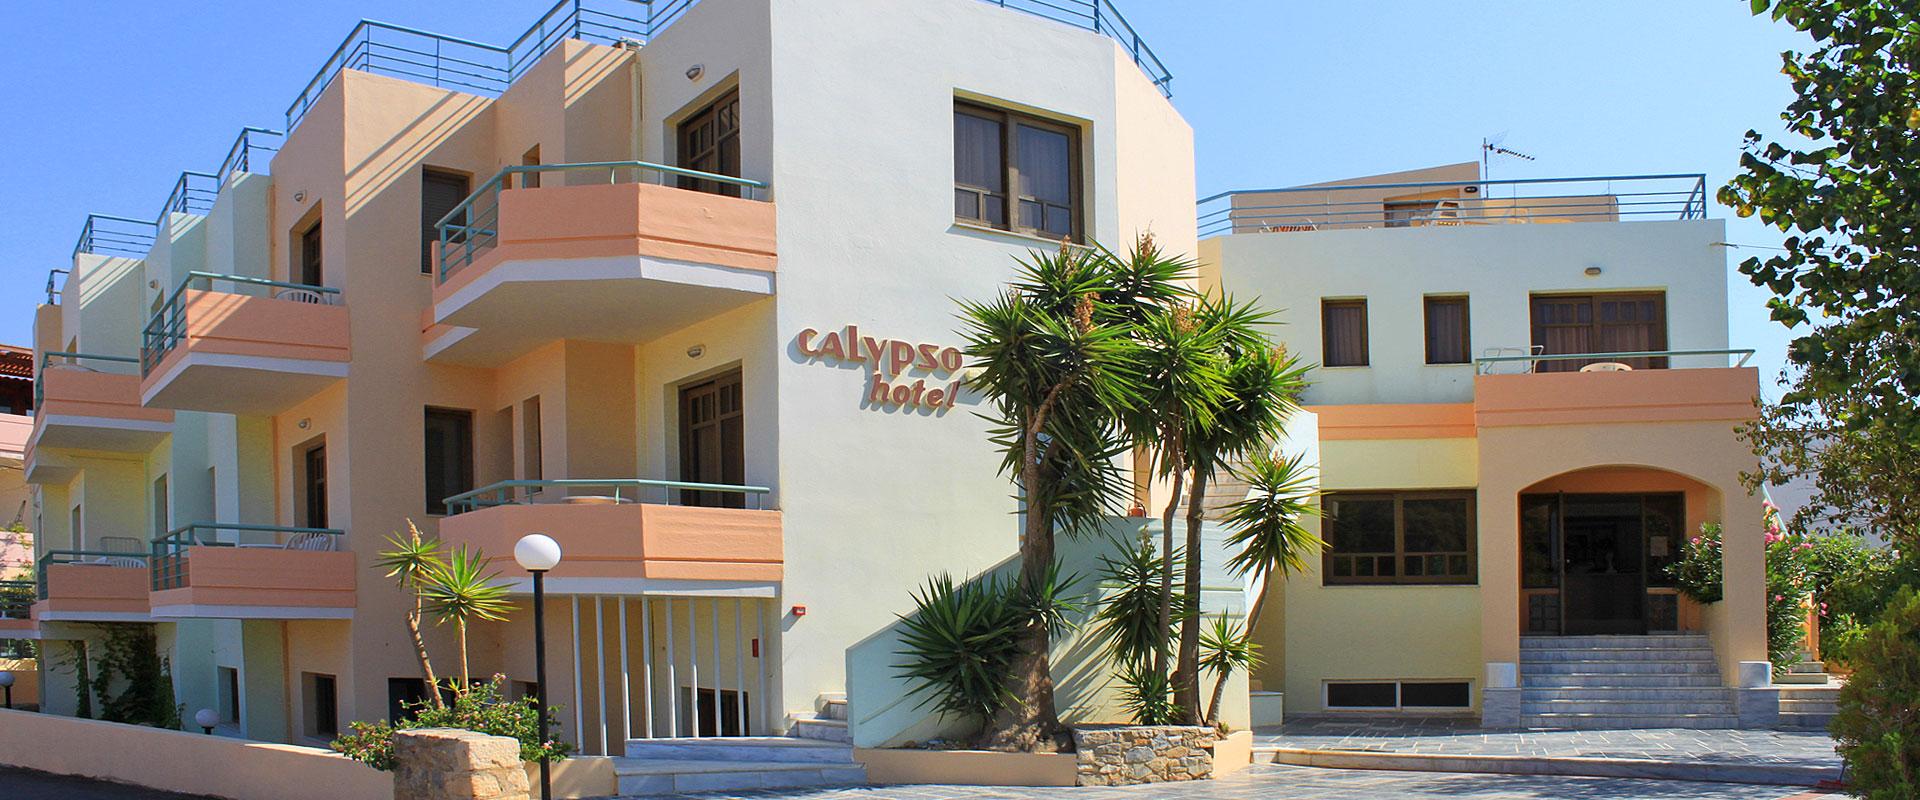 Calypso Hotel Chania